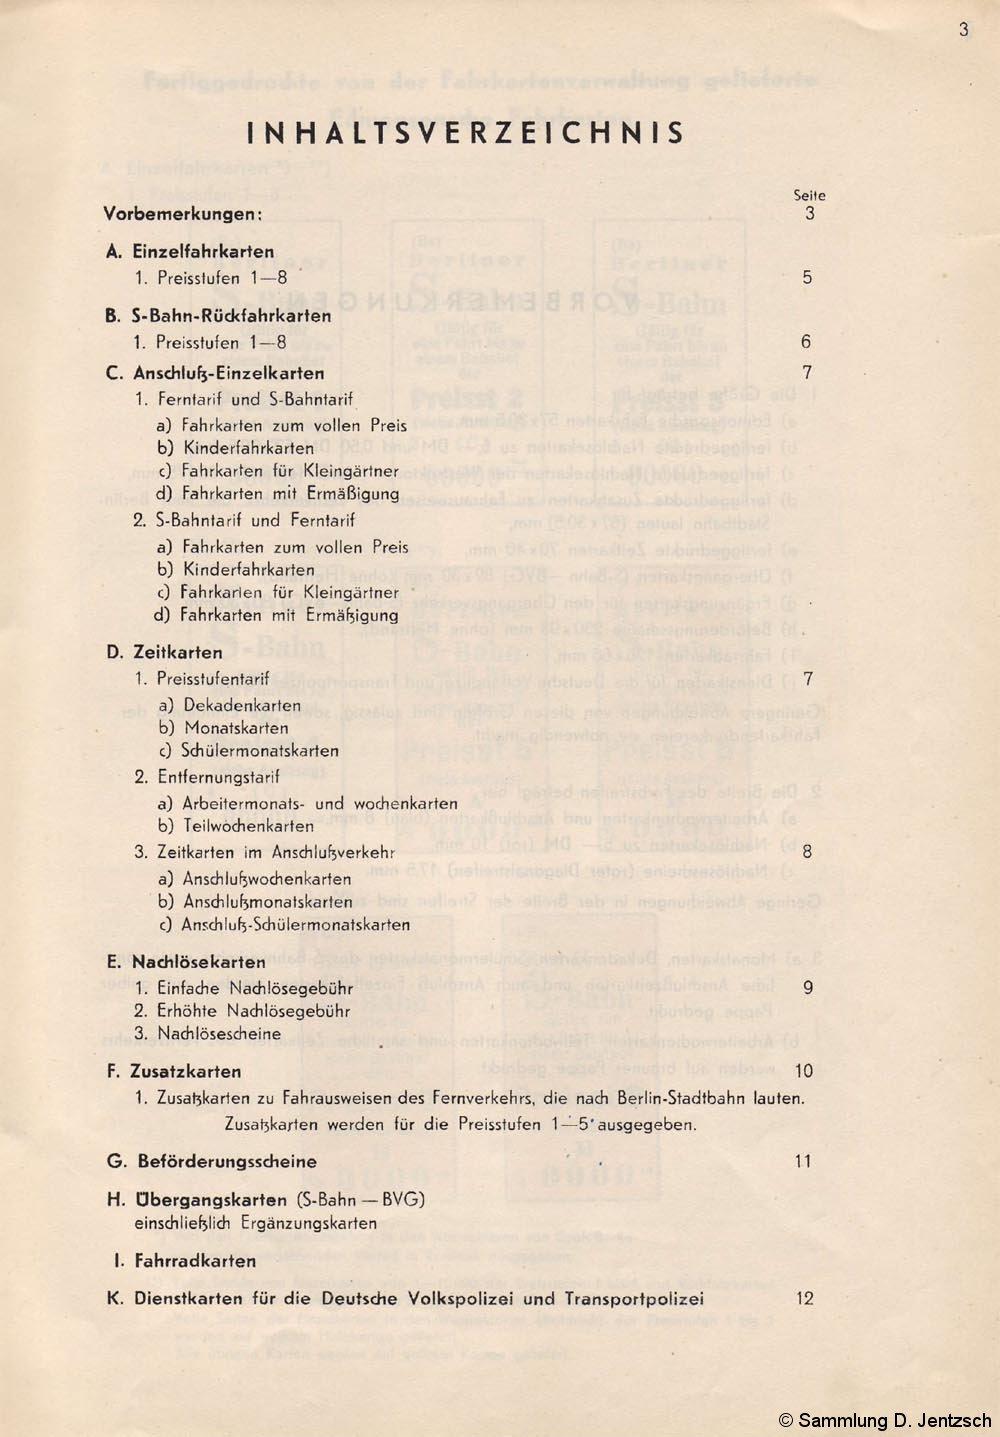 Bild: Muster Seite 3